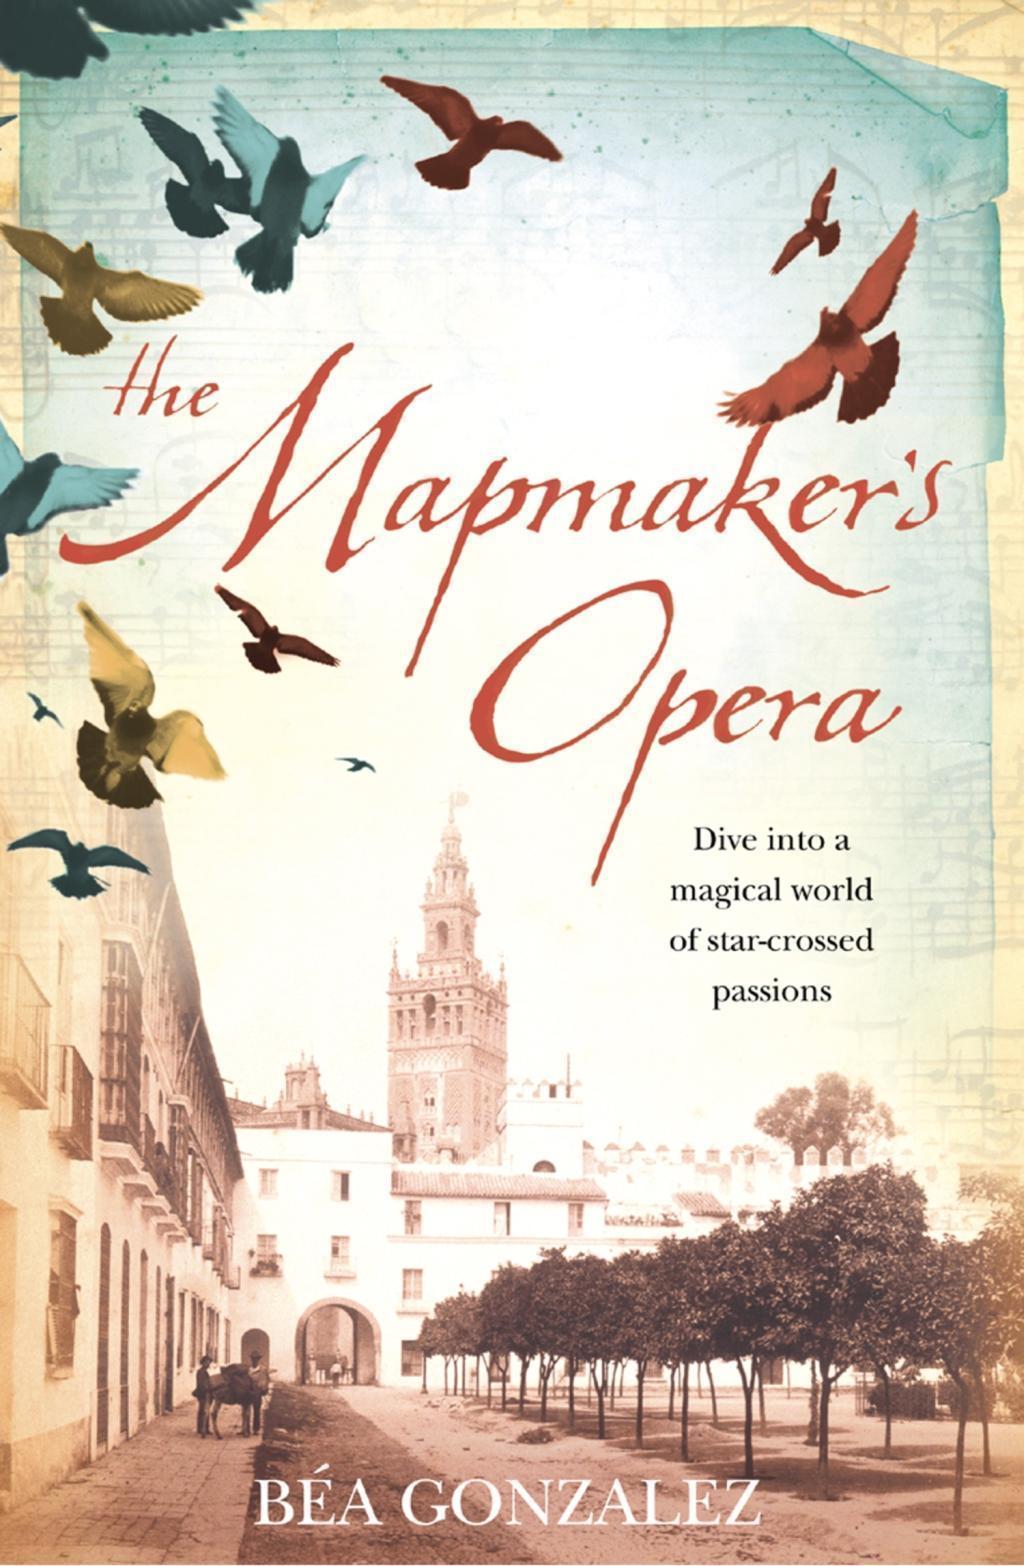 The Mapmaker's Opera